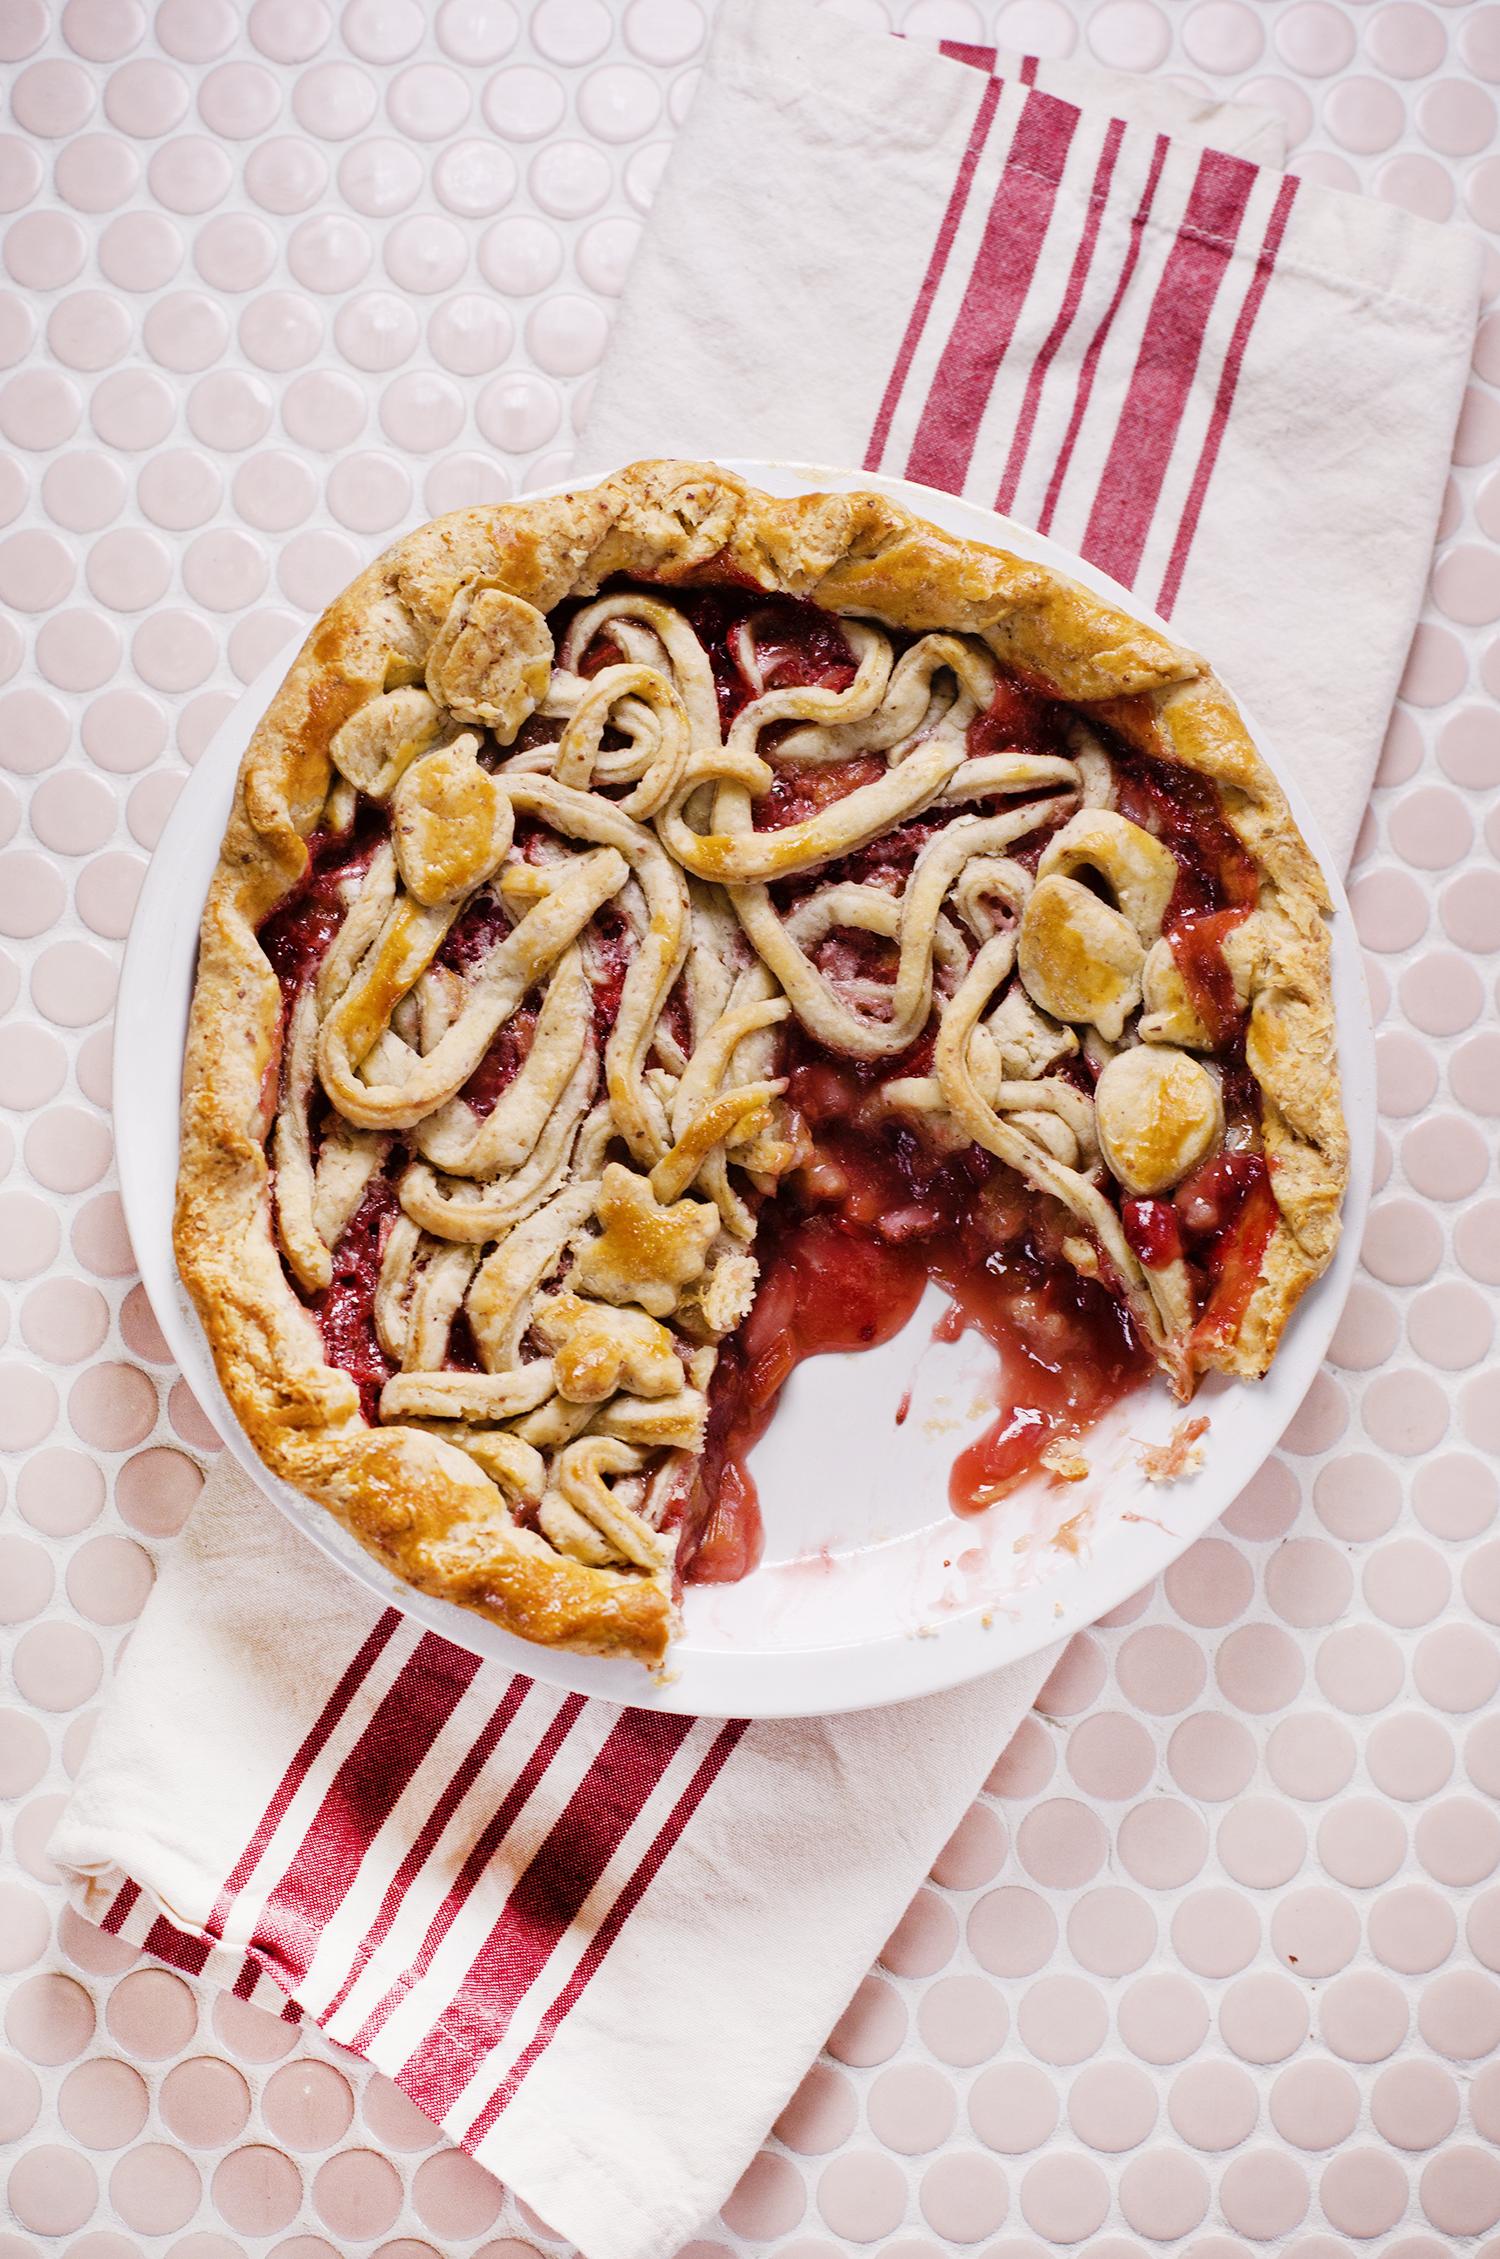 Rhubarb strawberry and almond pie (via abeautifulmess.com)